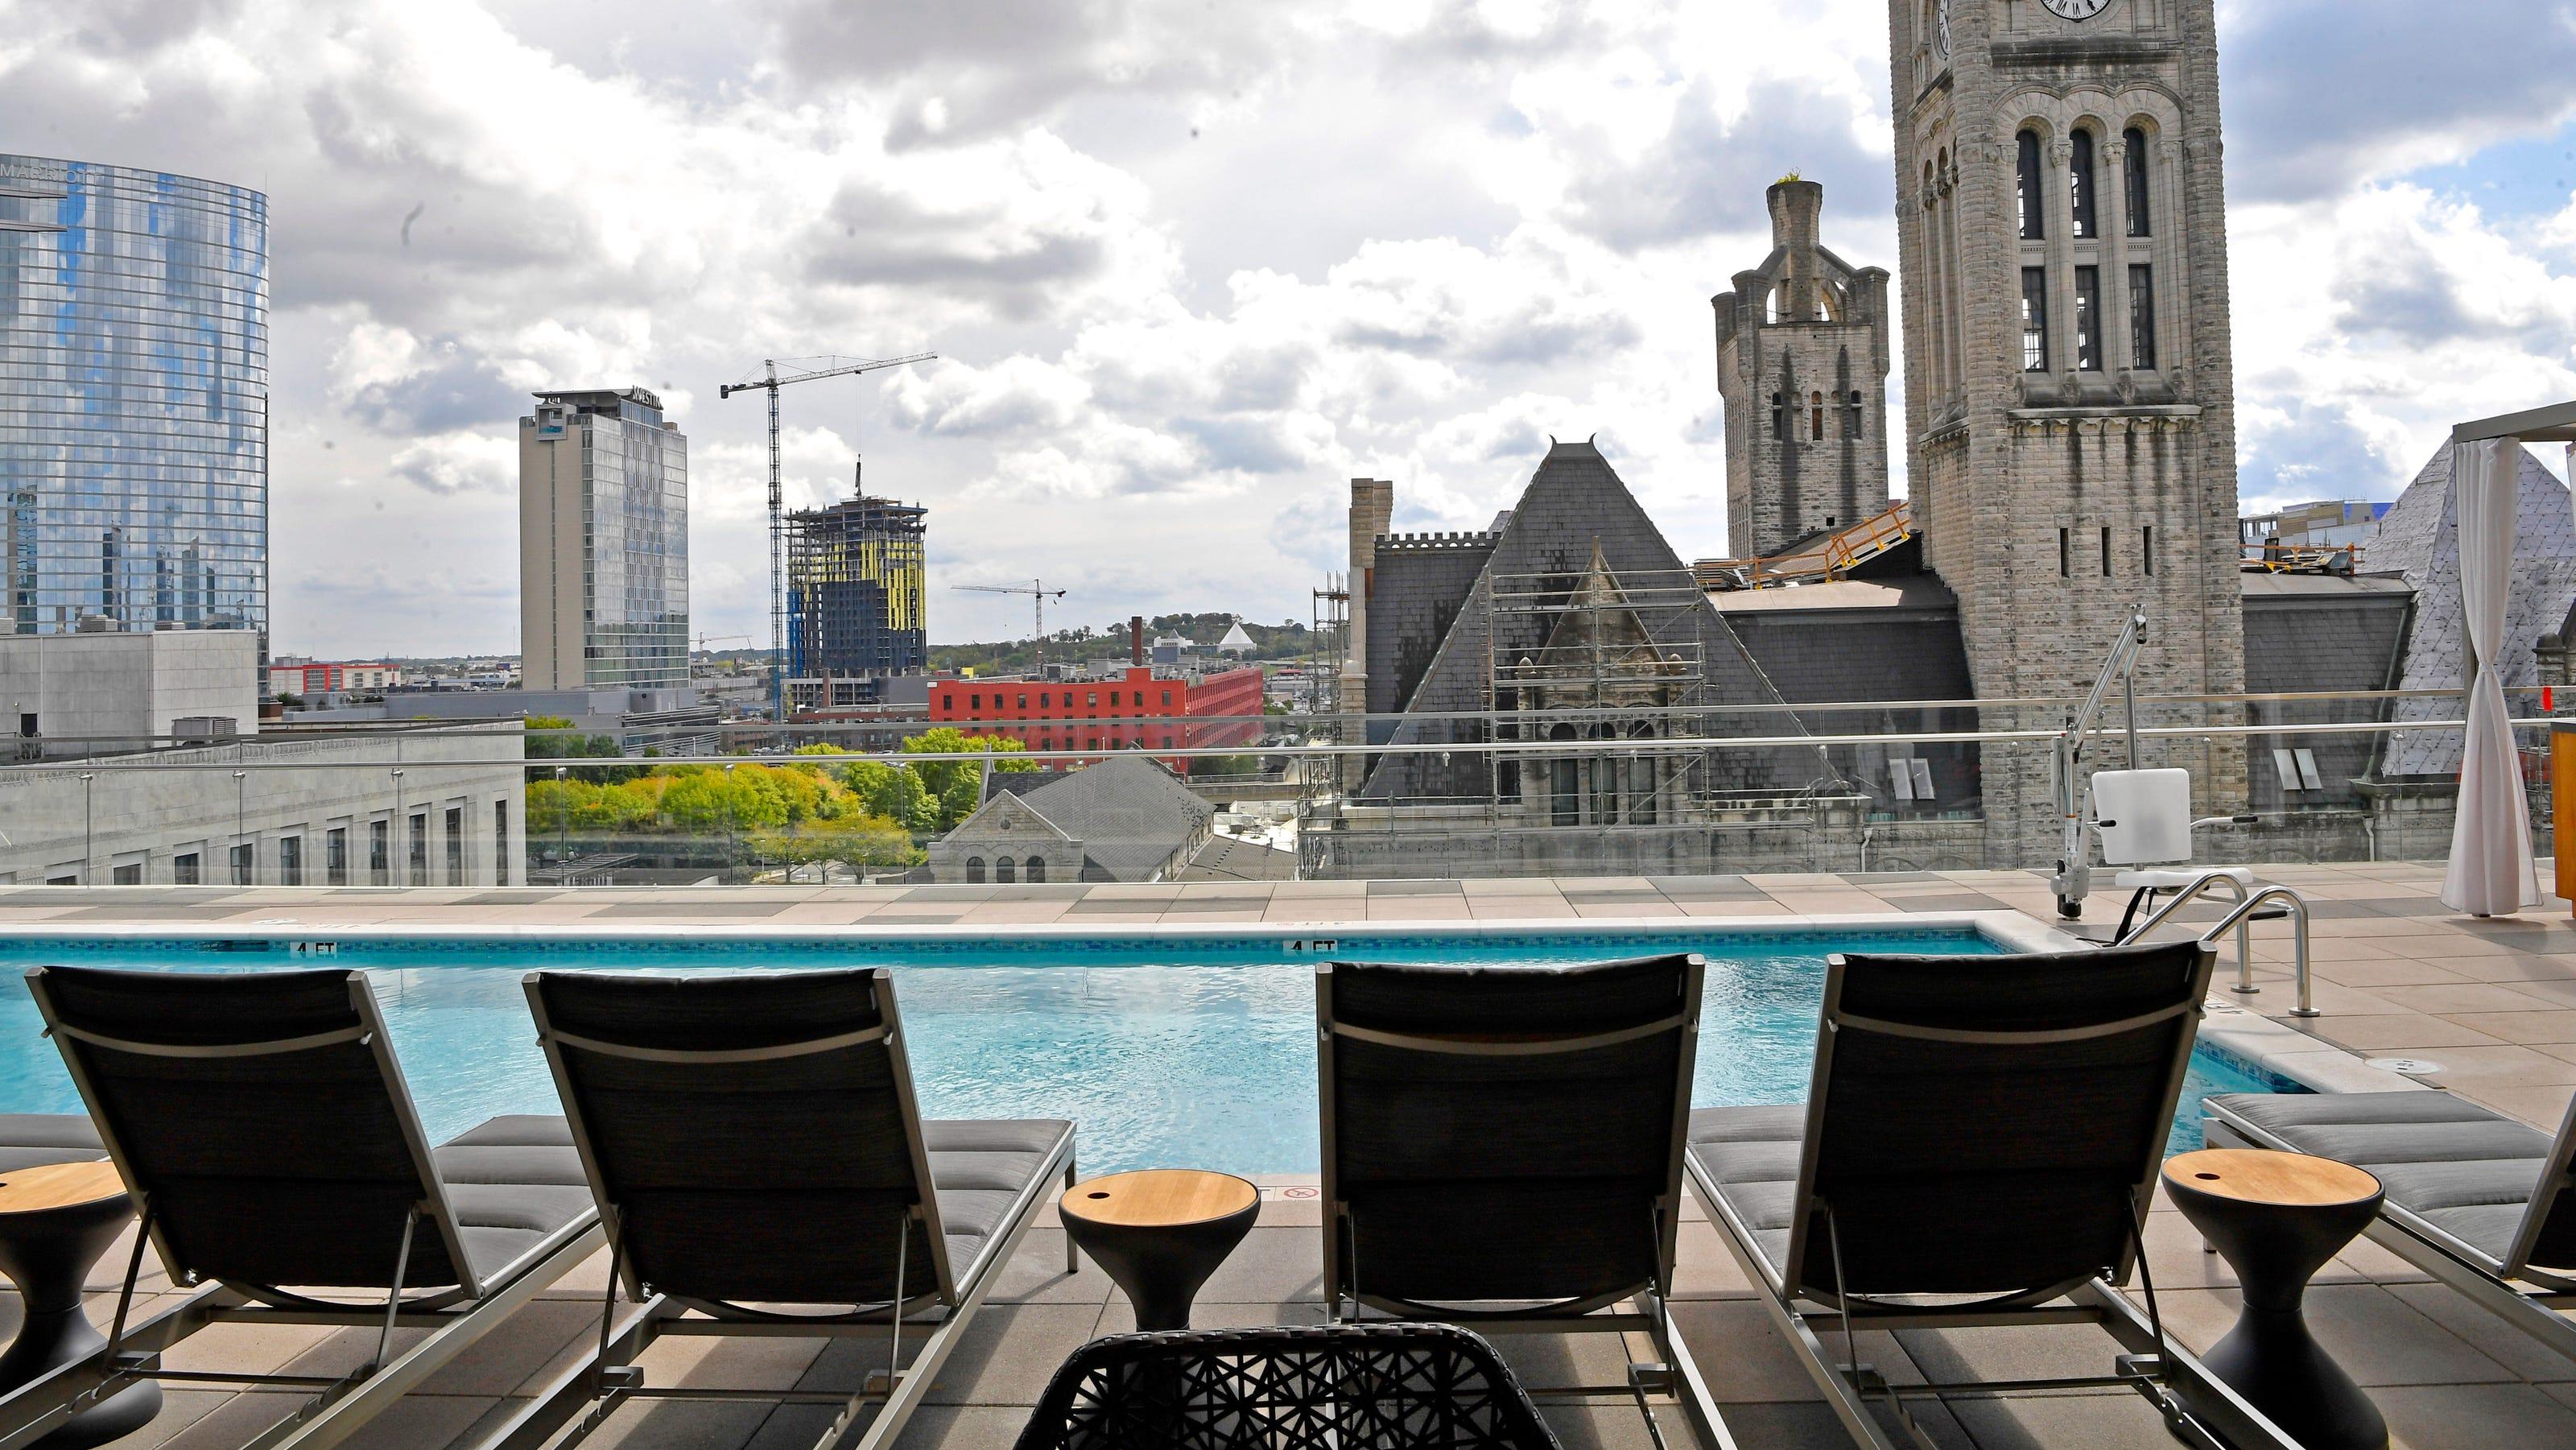 Grand Hyatt Hotel At Nashville Yards To Open Soon